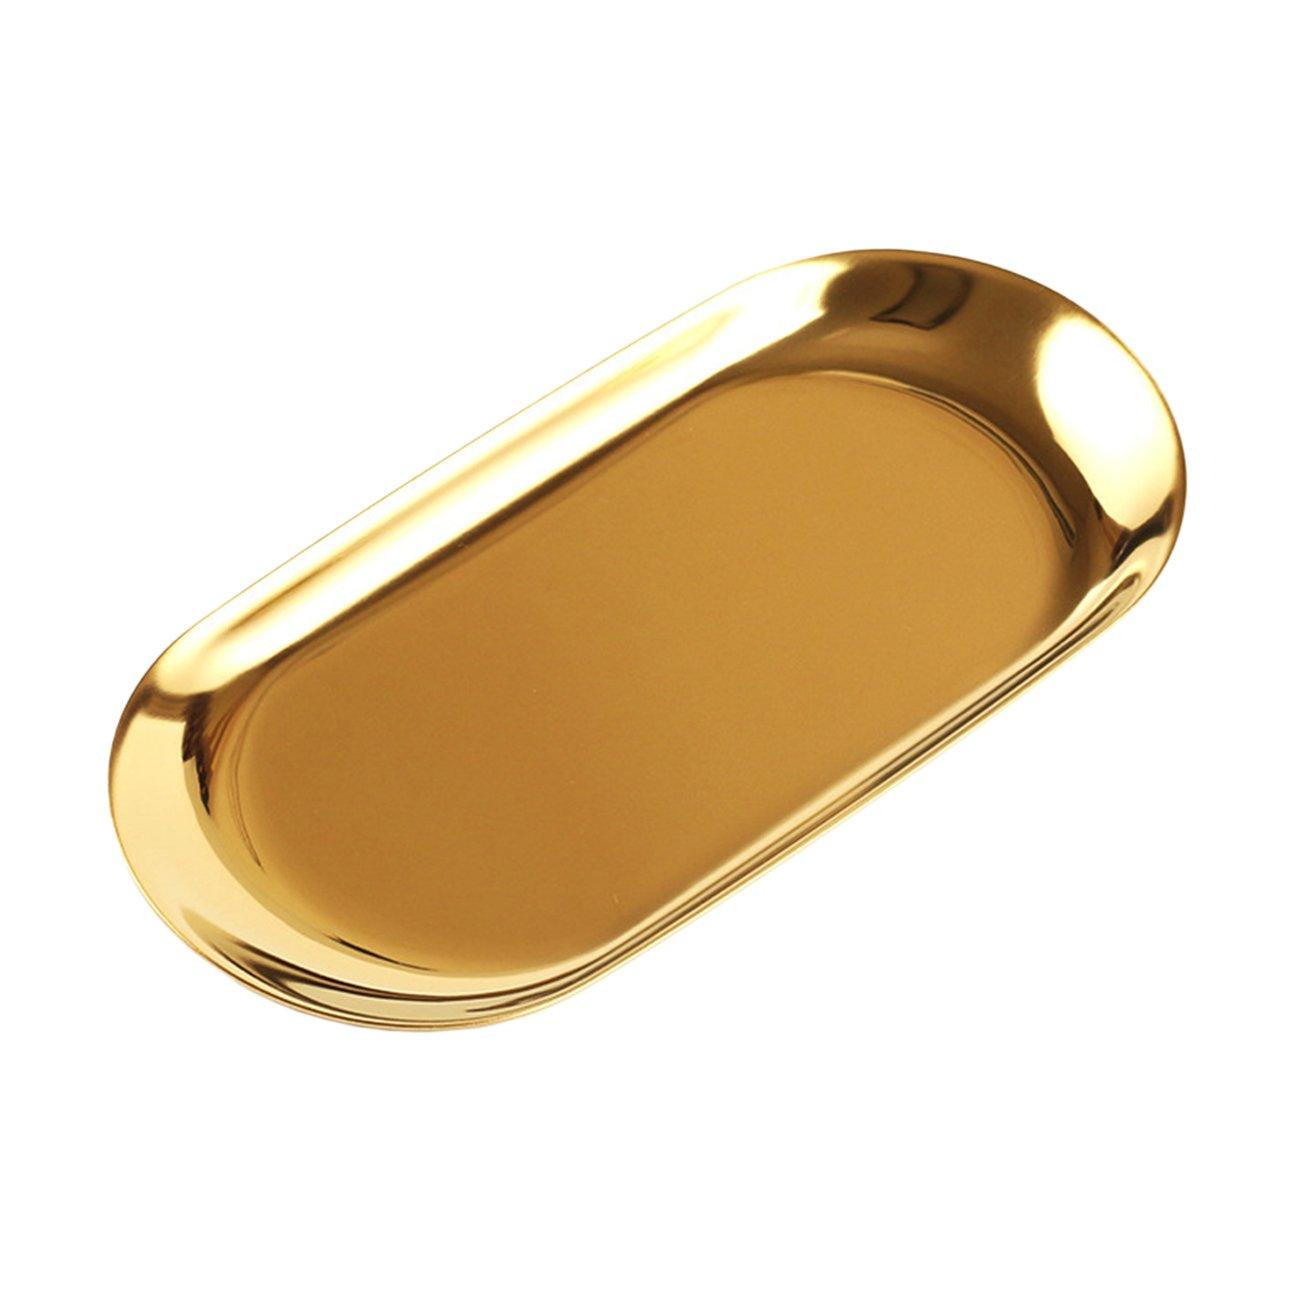 THEE Oval Tray Key Jewelry Cosmetics Tray Storage Table Decoration